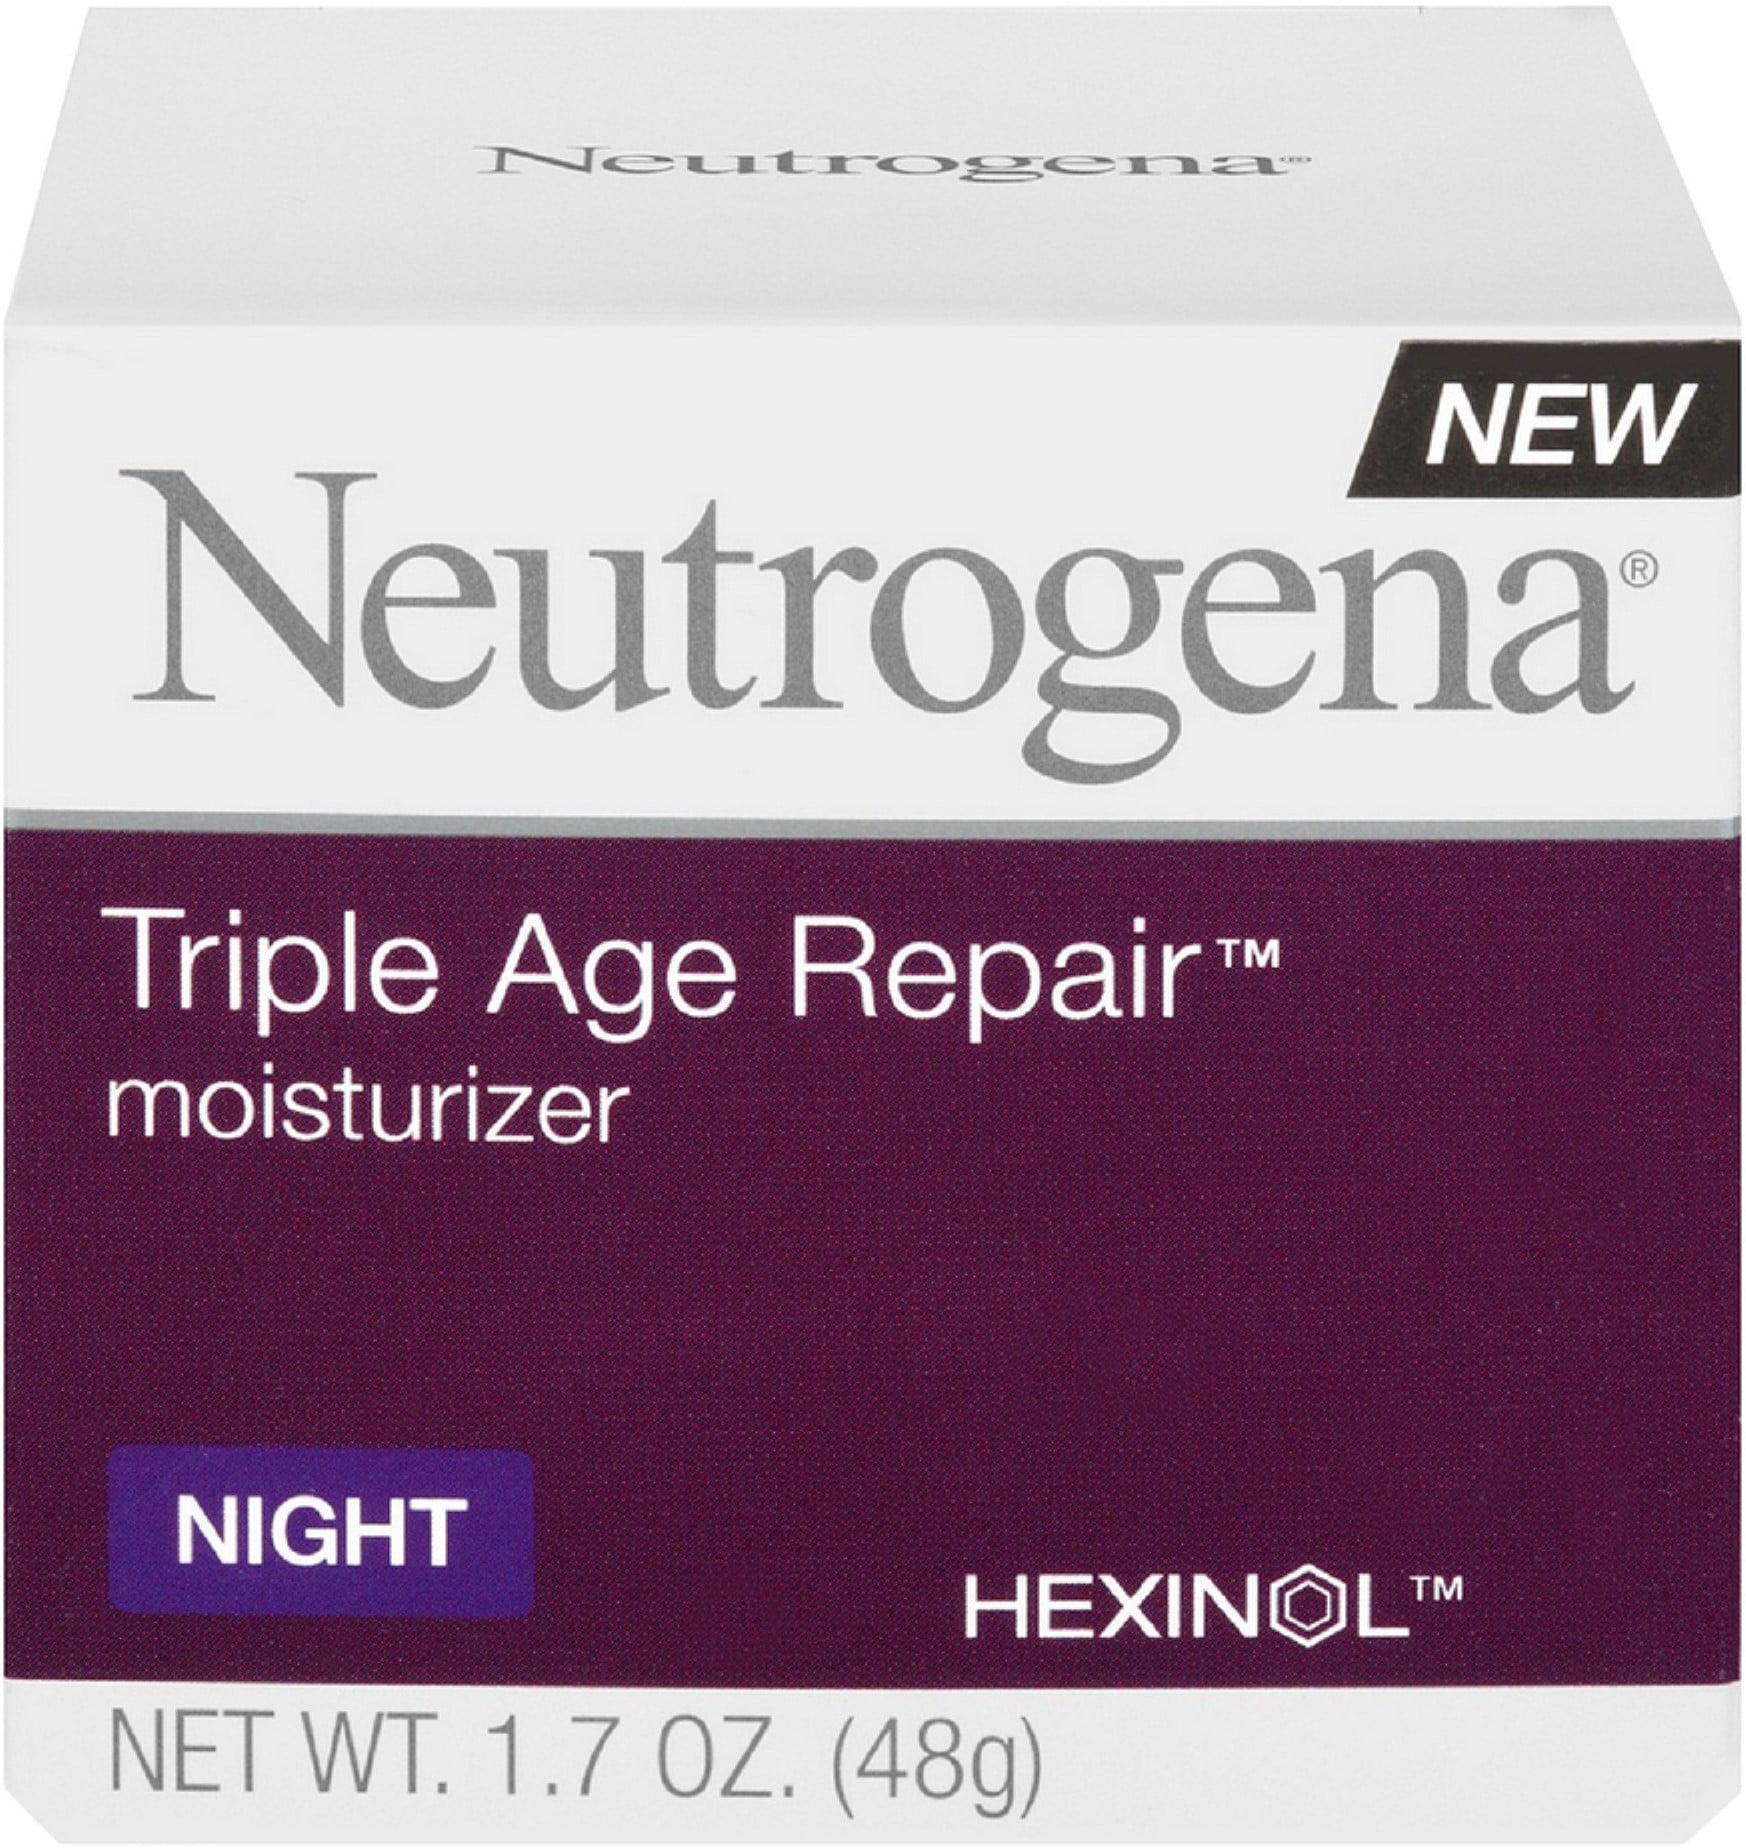 Neutrogena Triple Age Repair Night Moisturizer, 1.7 oz (Pack of 2)